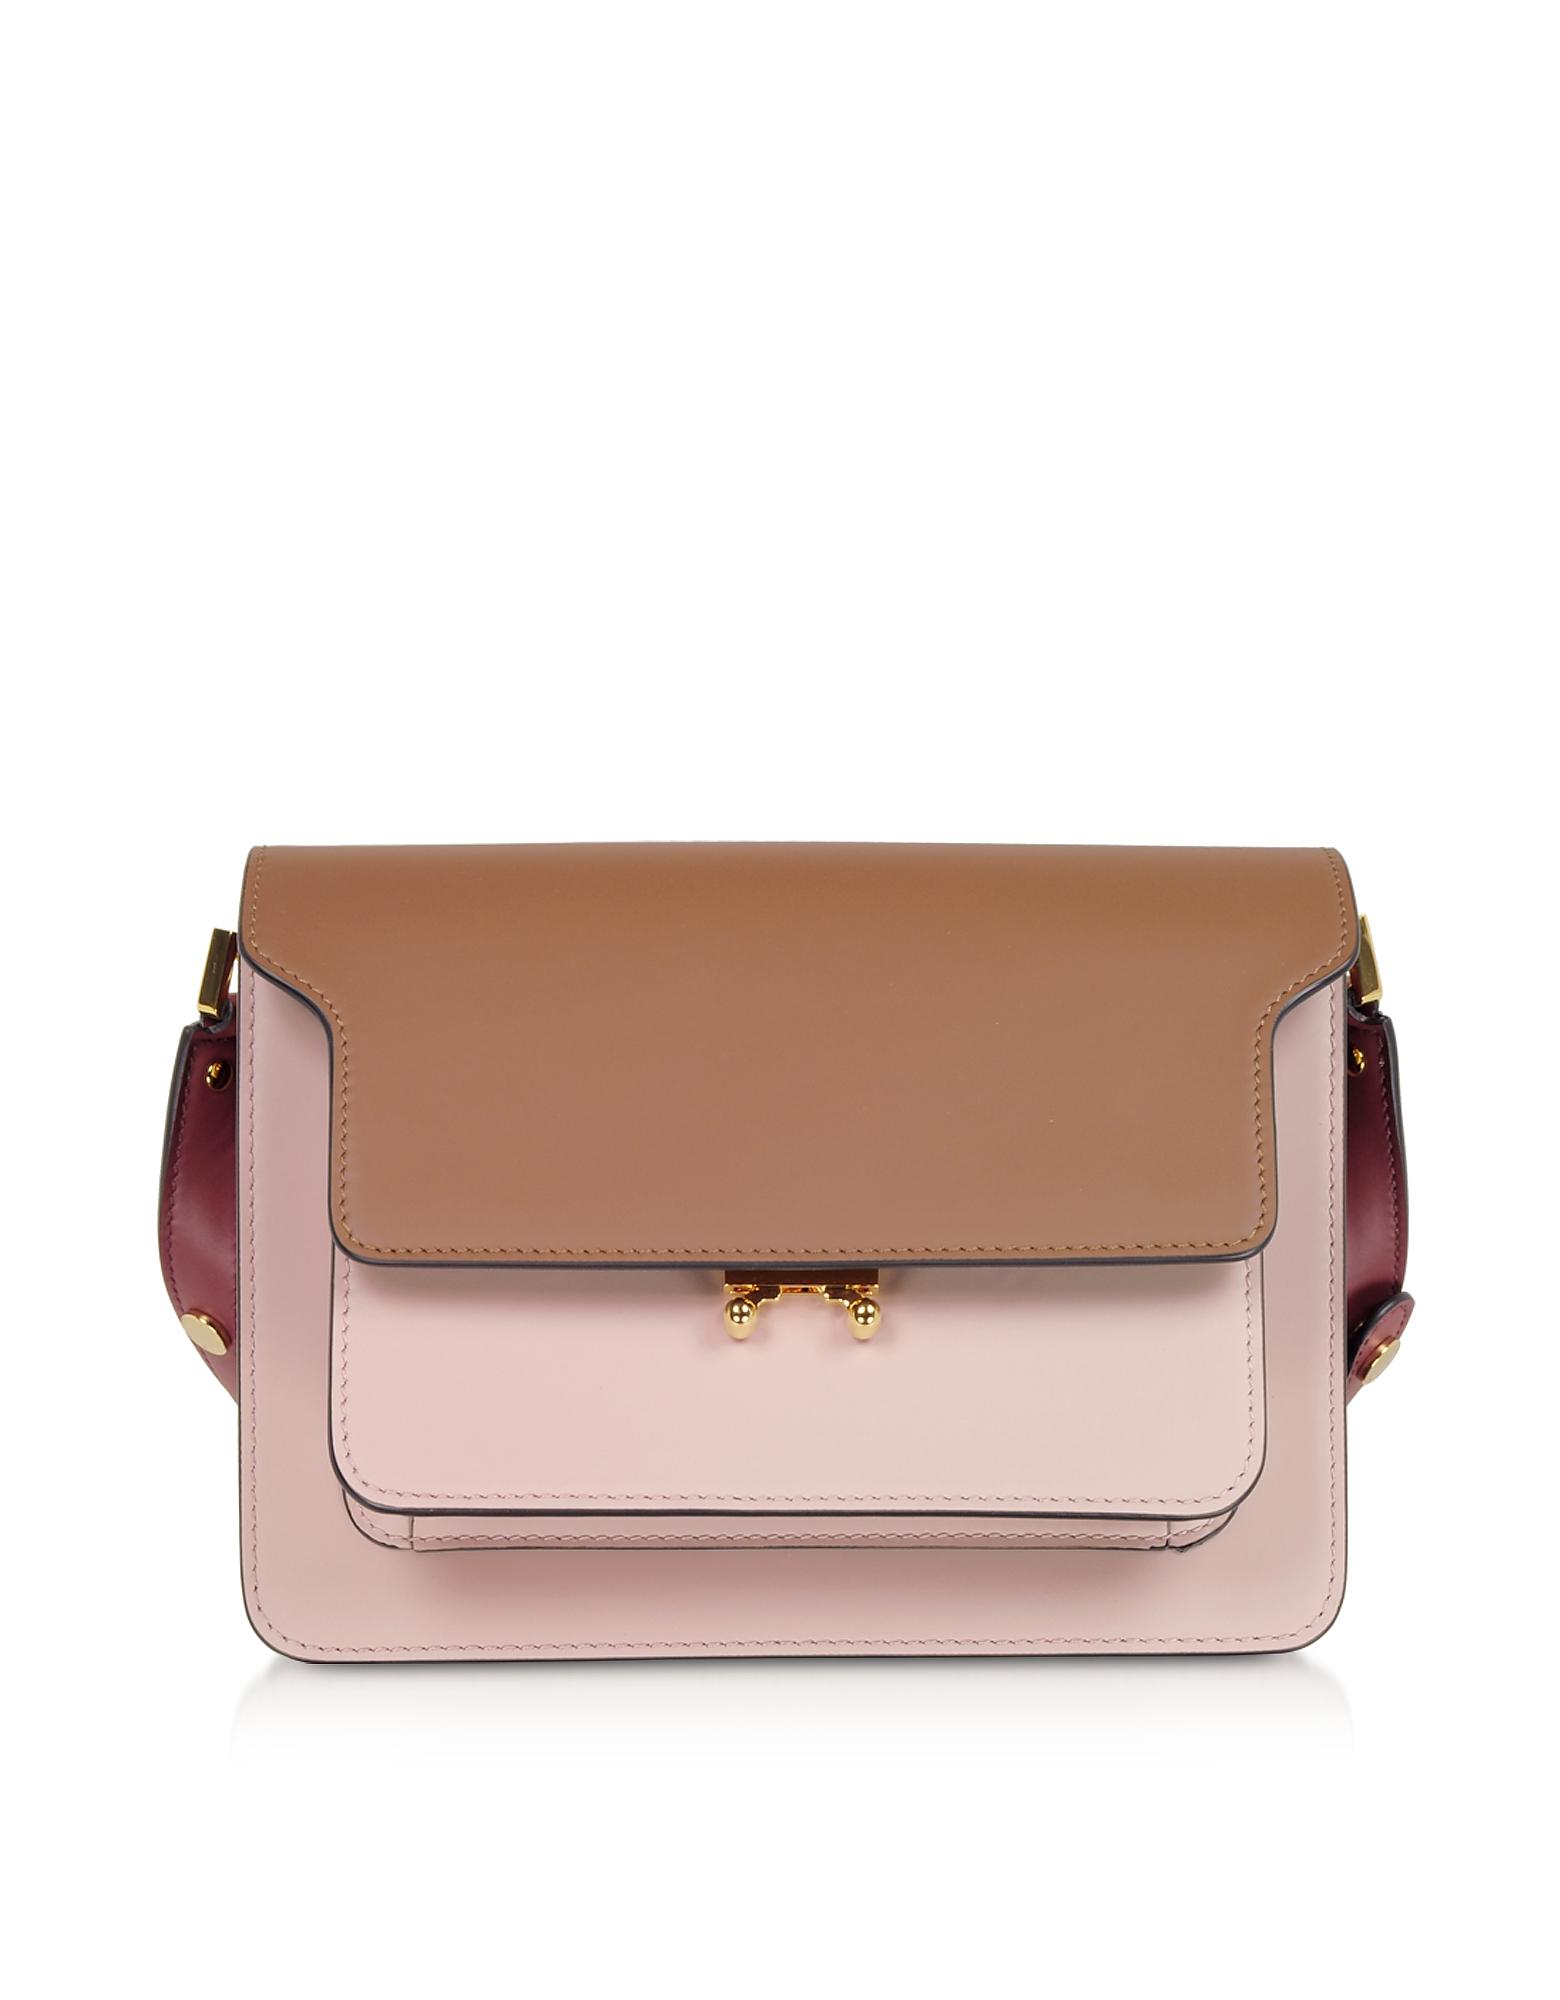 Marni Designer Handbags, Gold Brown, Quartz and Black Cherry TRUNK Bag